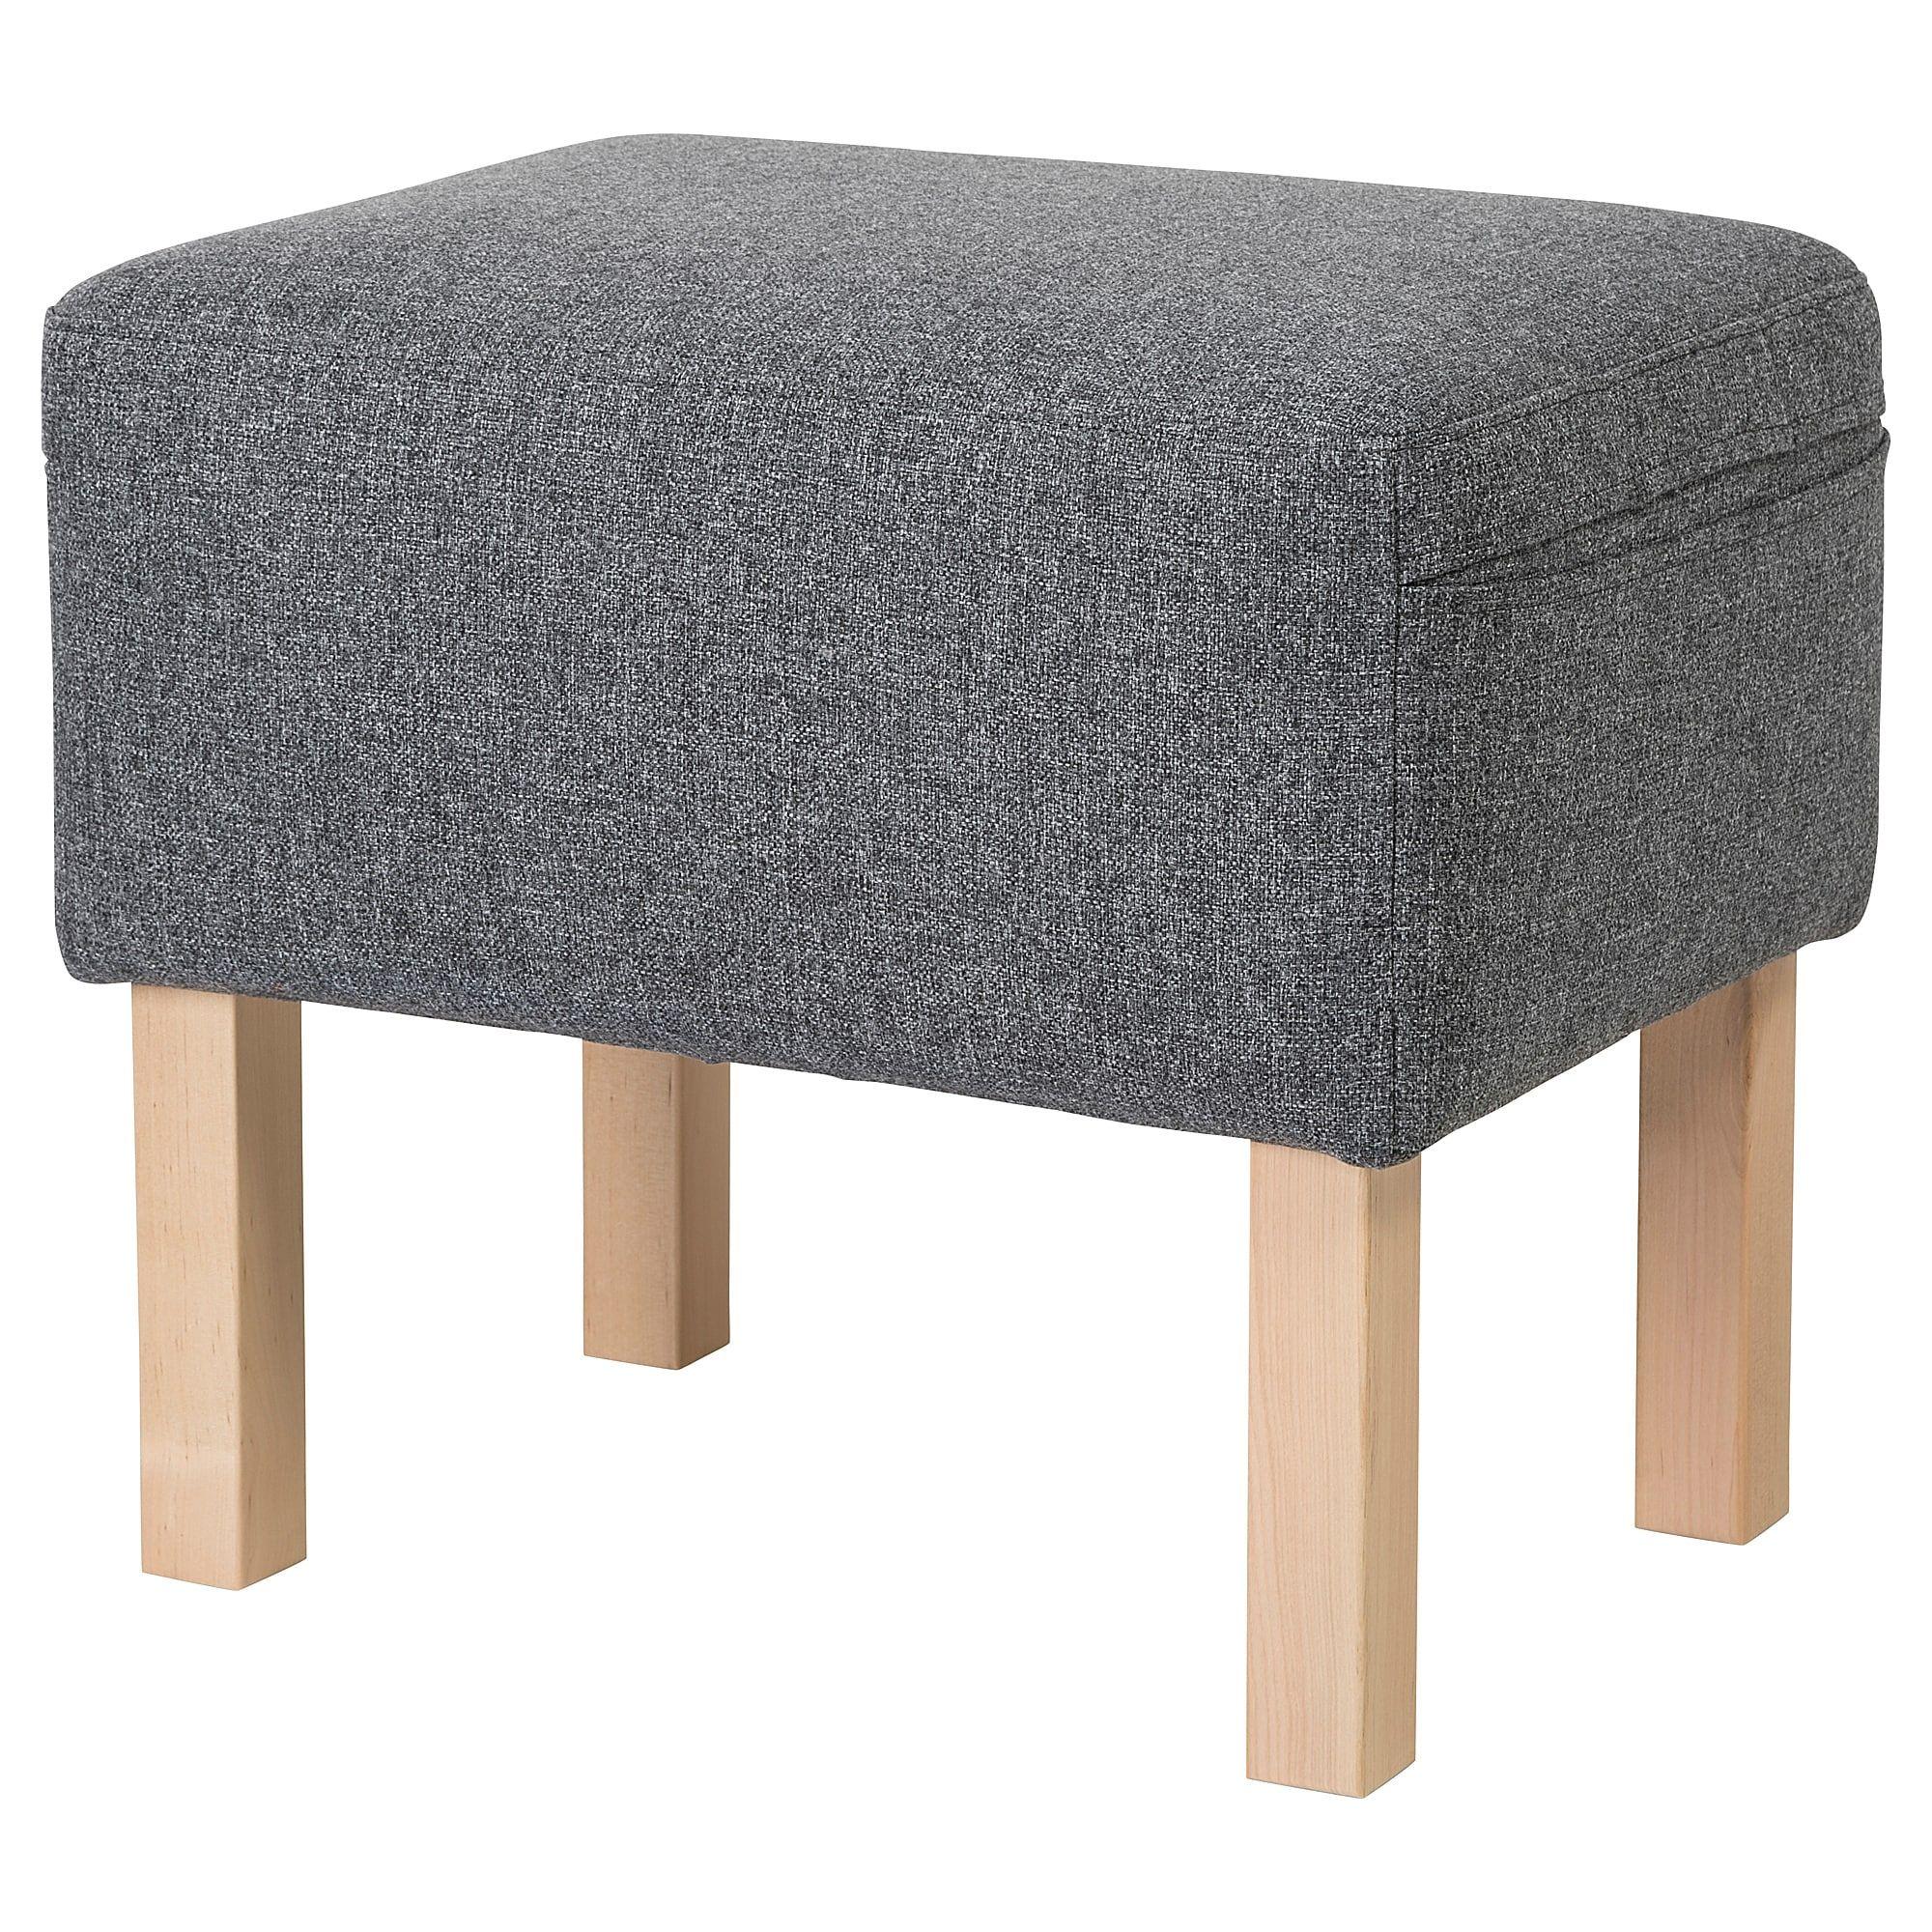 Omtanksam Footstools Pouffes Ikea Ikea Footstool Living